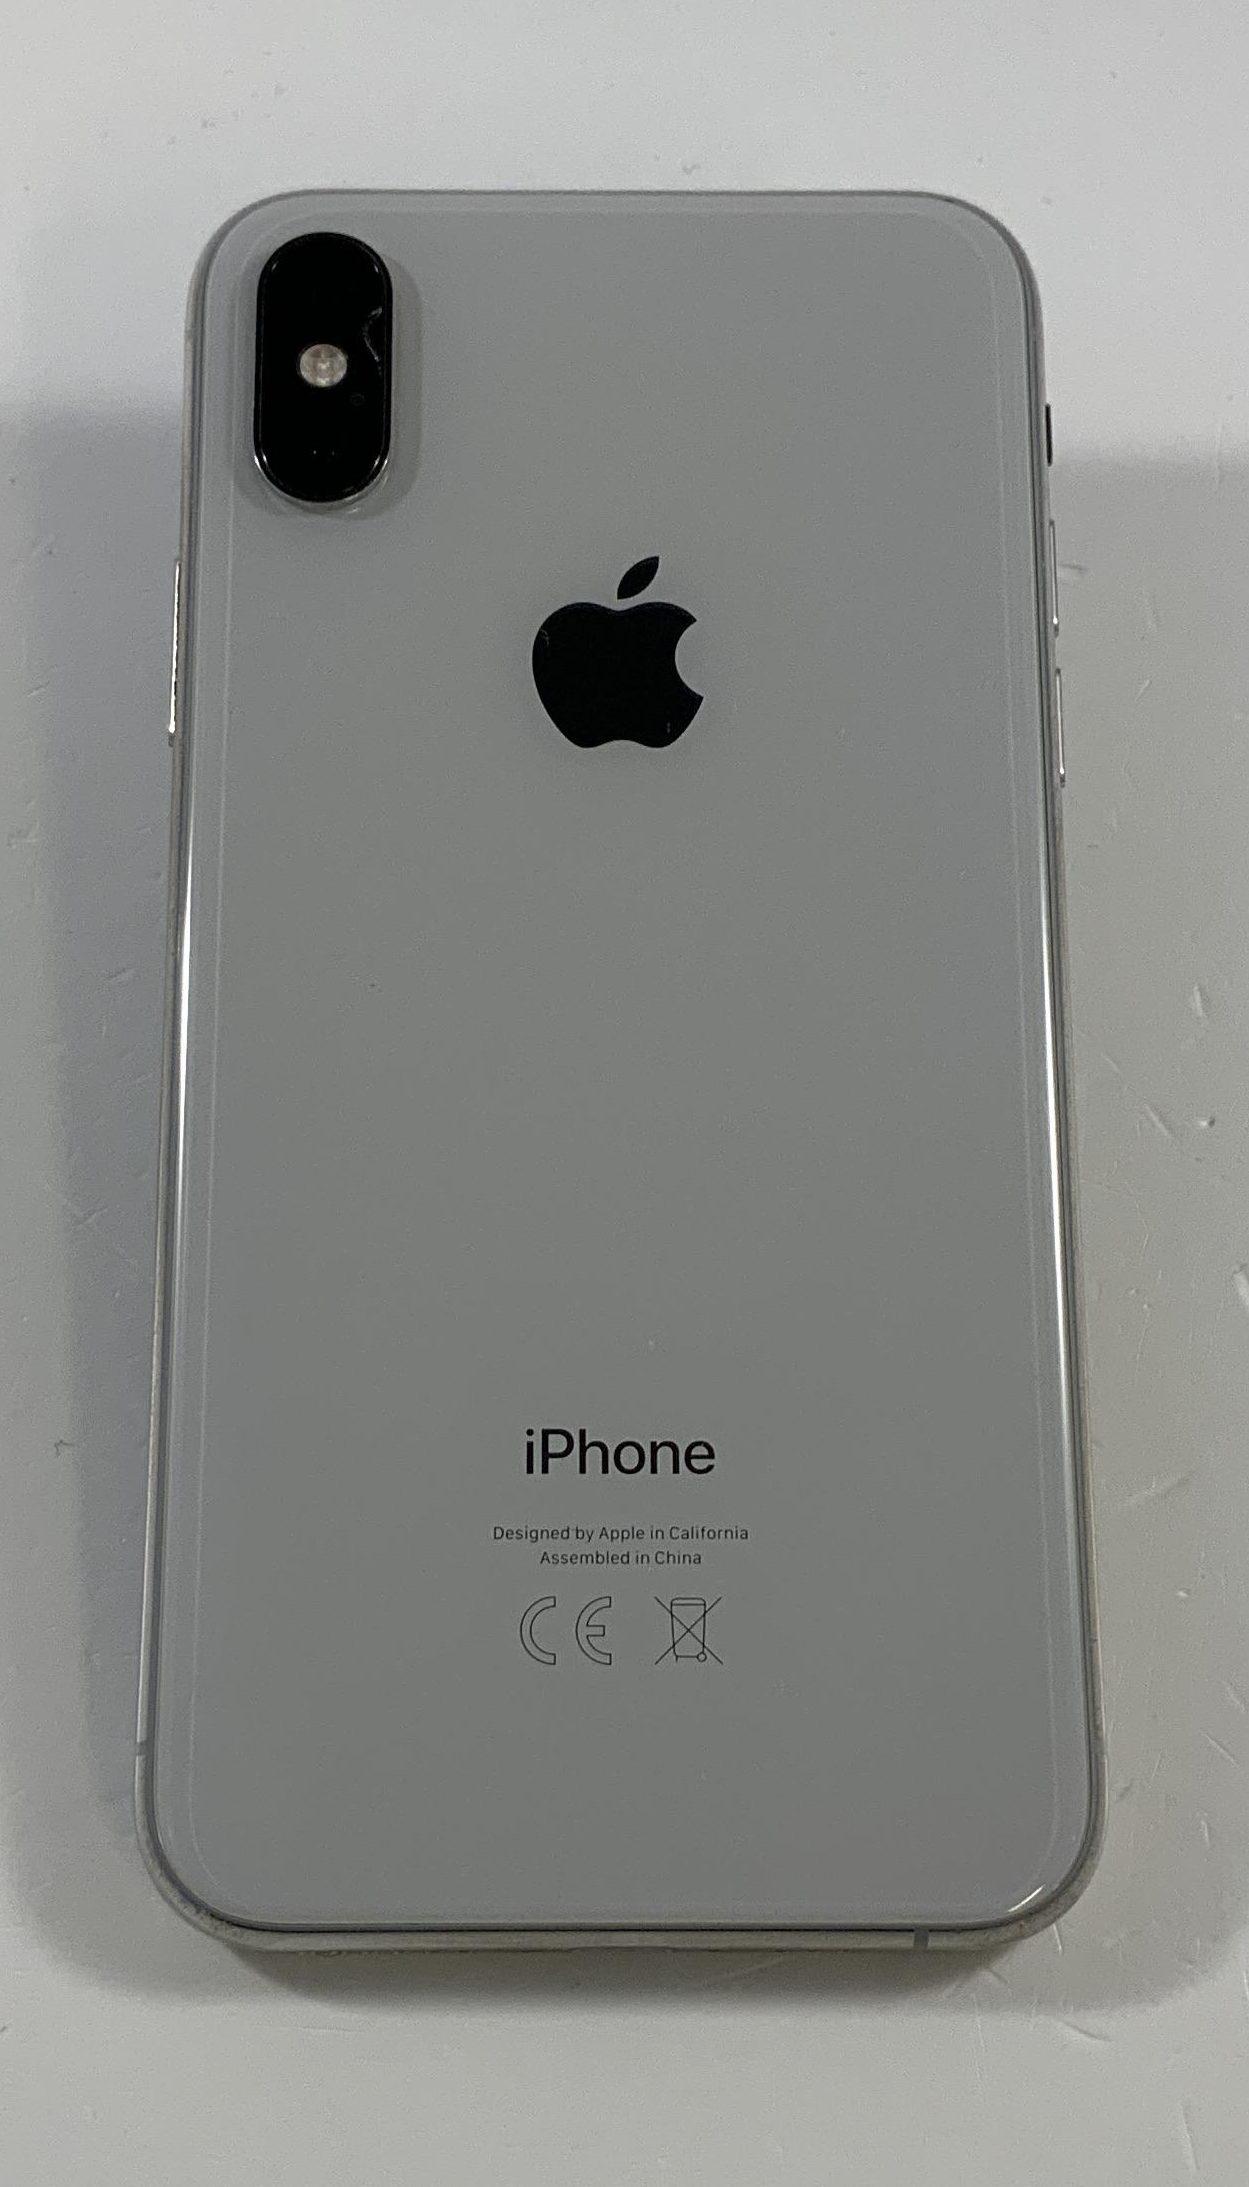 iPhone XS 64GB, 64GB, Silver, imagen 2